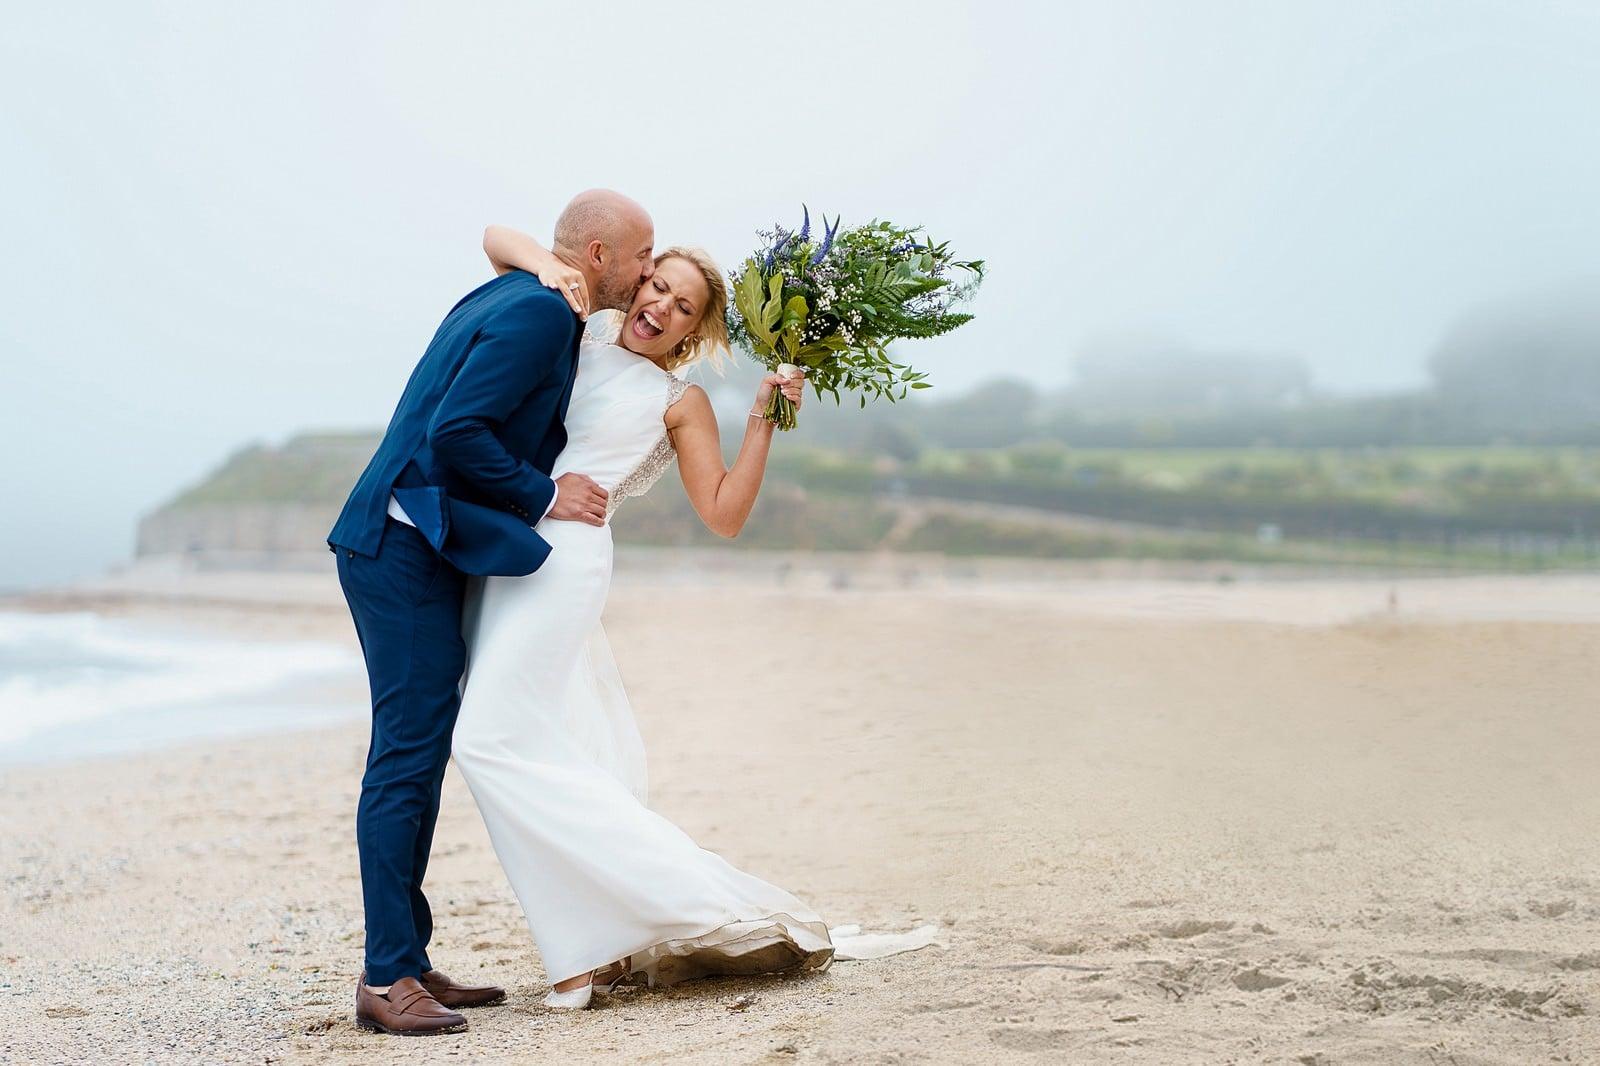 Greenbank hotel wedding photographer 5